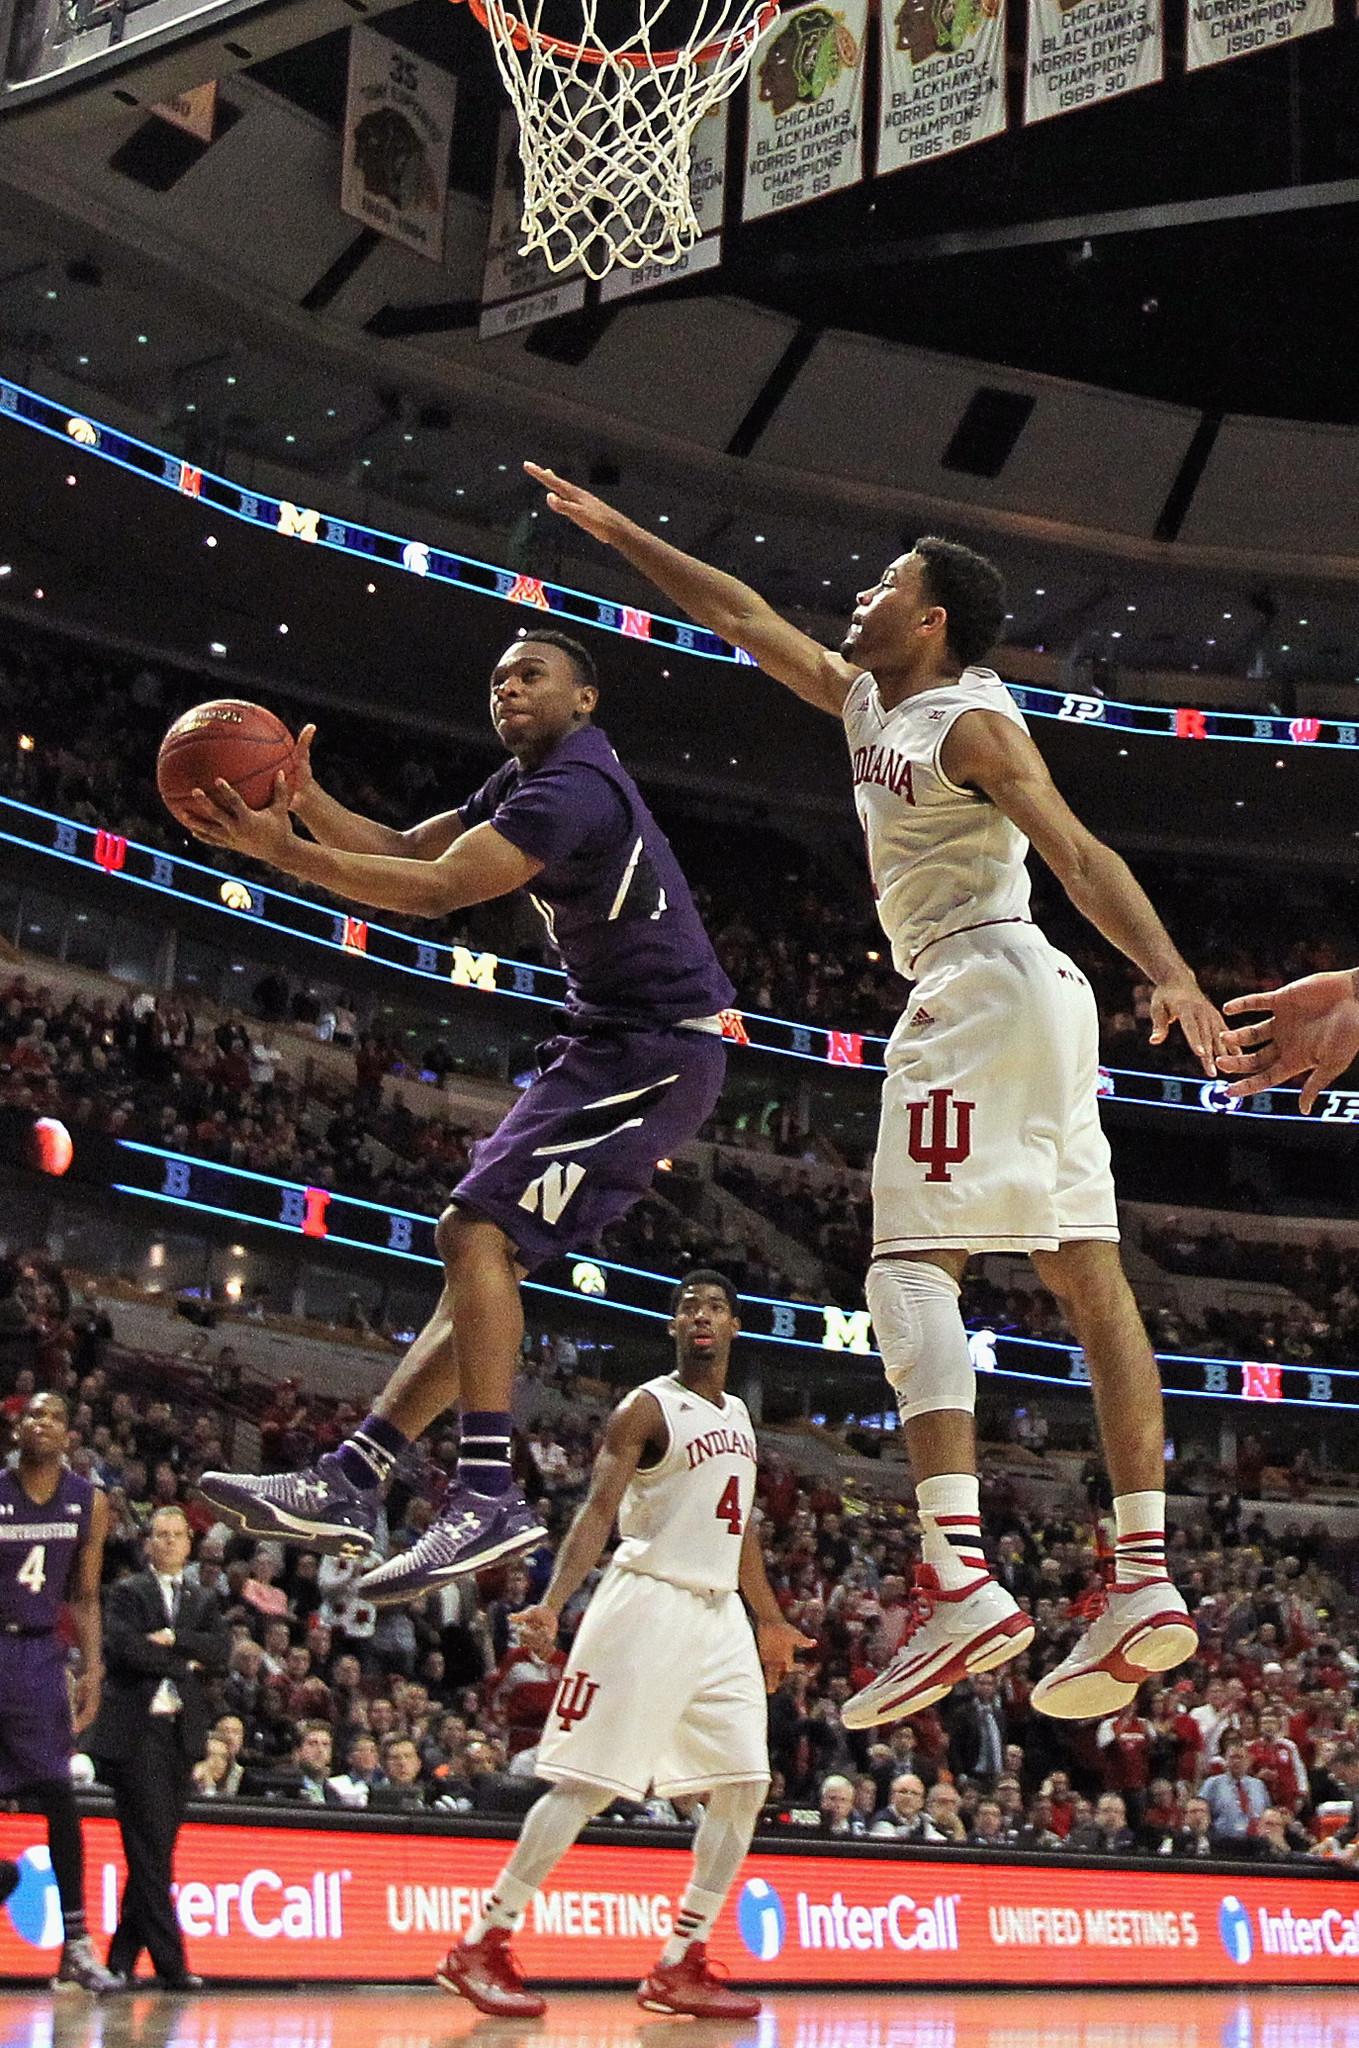 ee3eca17c86 Guard Johnnie Vassar sues NCAA